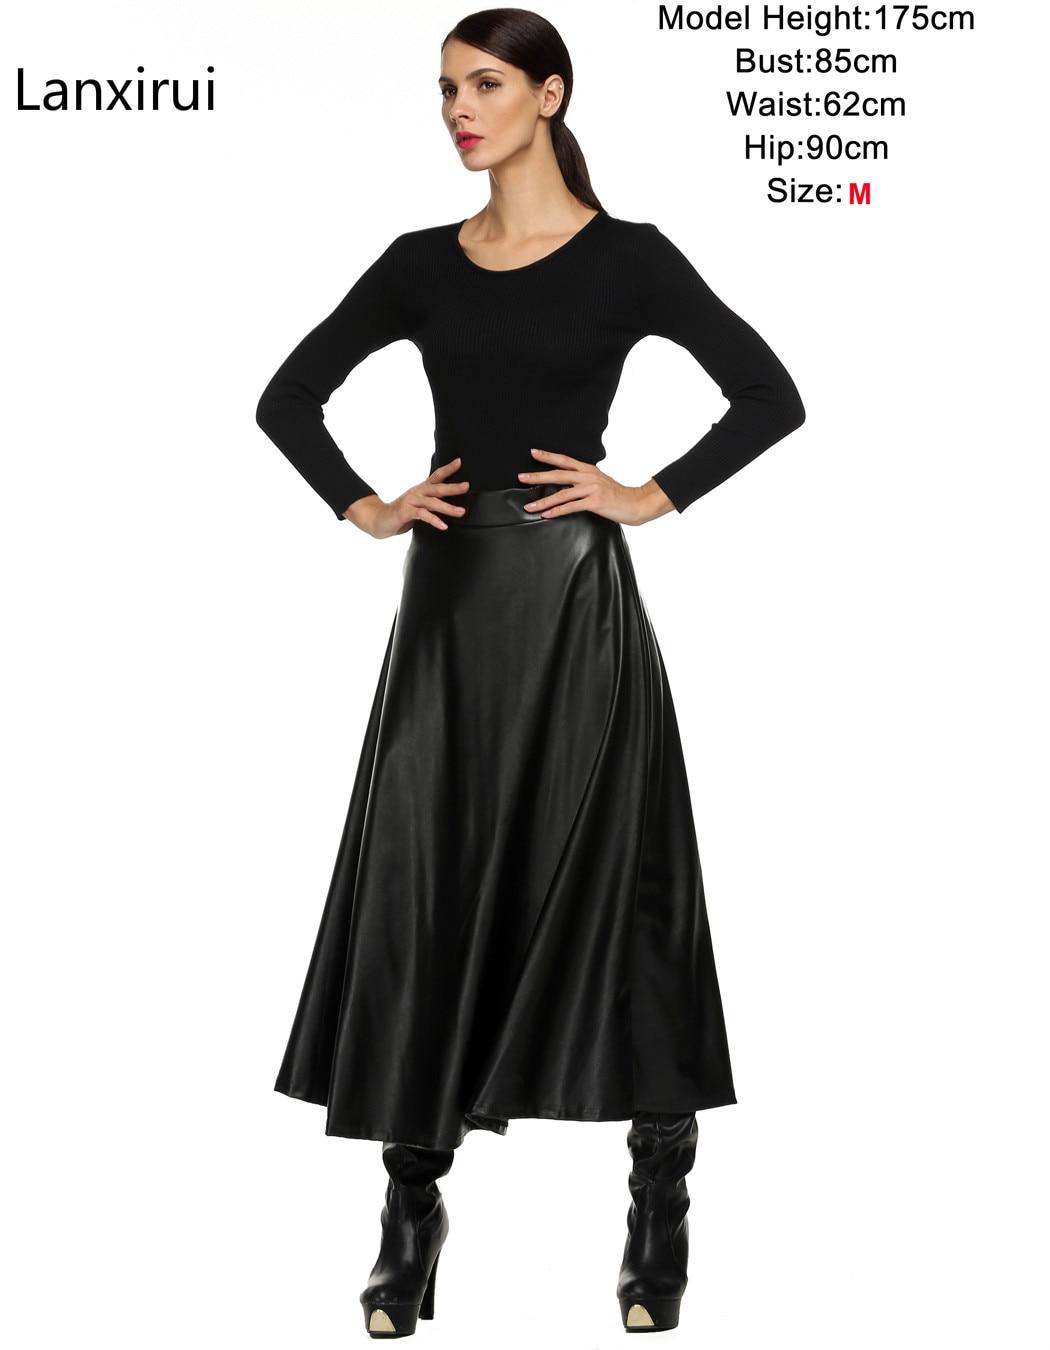 Winter Pu Leather Skirt Women Maxi Long Skirts Womens High Waist Slim Autumn Vintage Pleated Skirt Black Xl Xxl 4